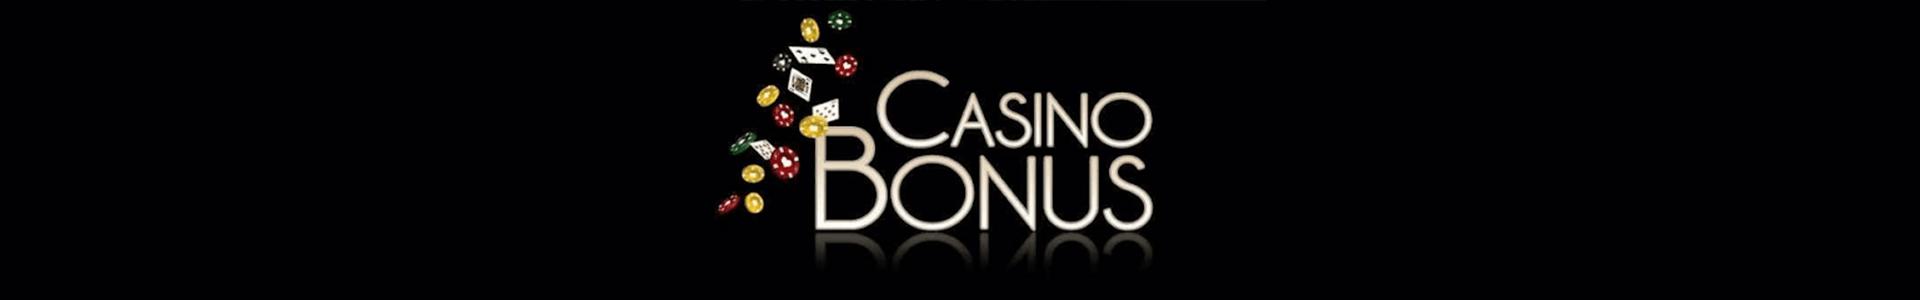 Betting Bonus Nsw